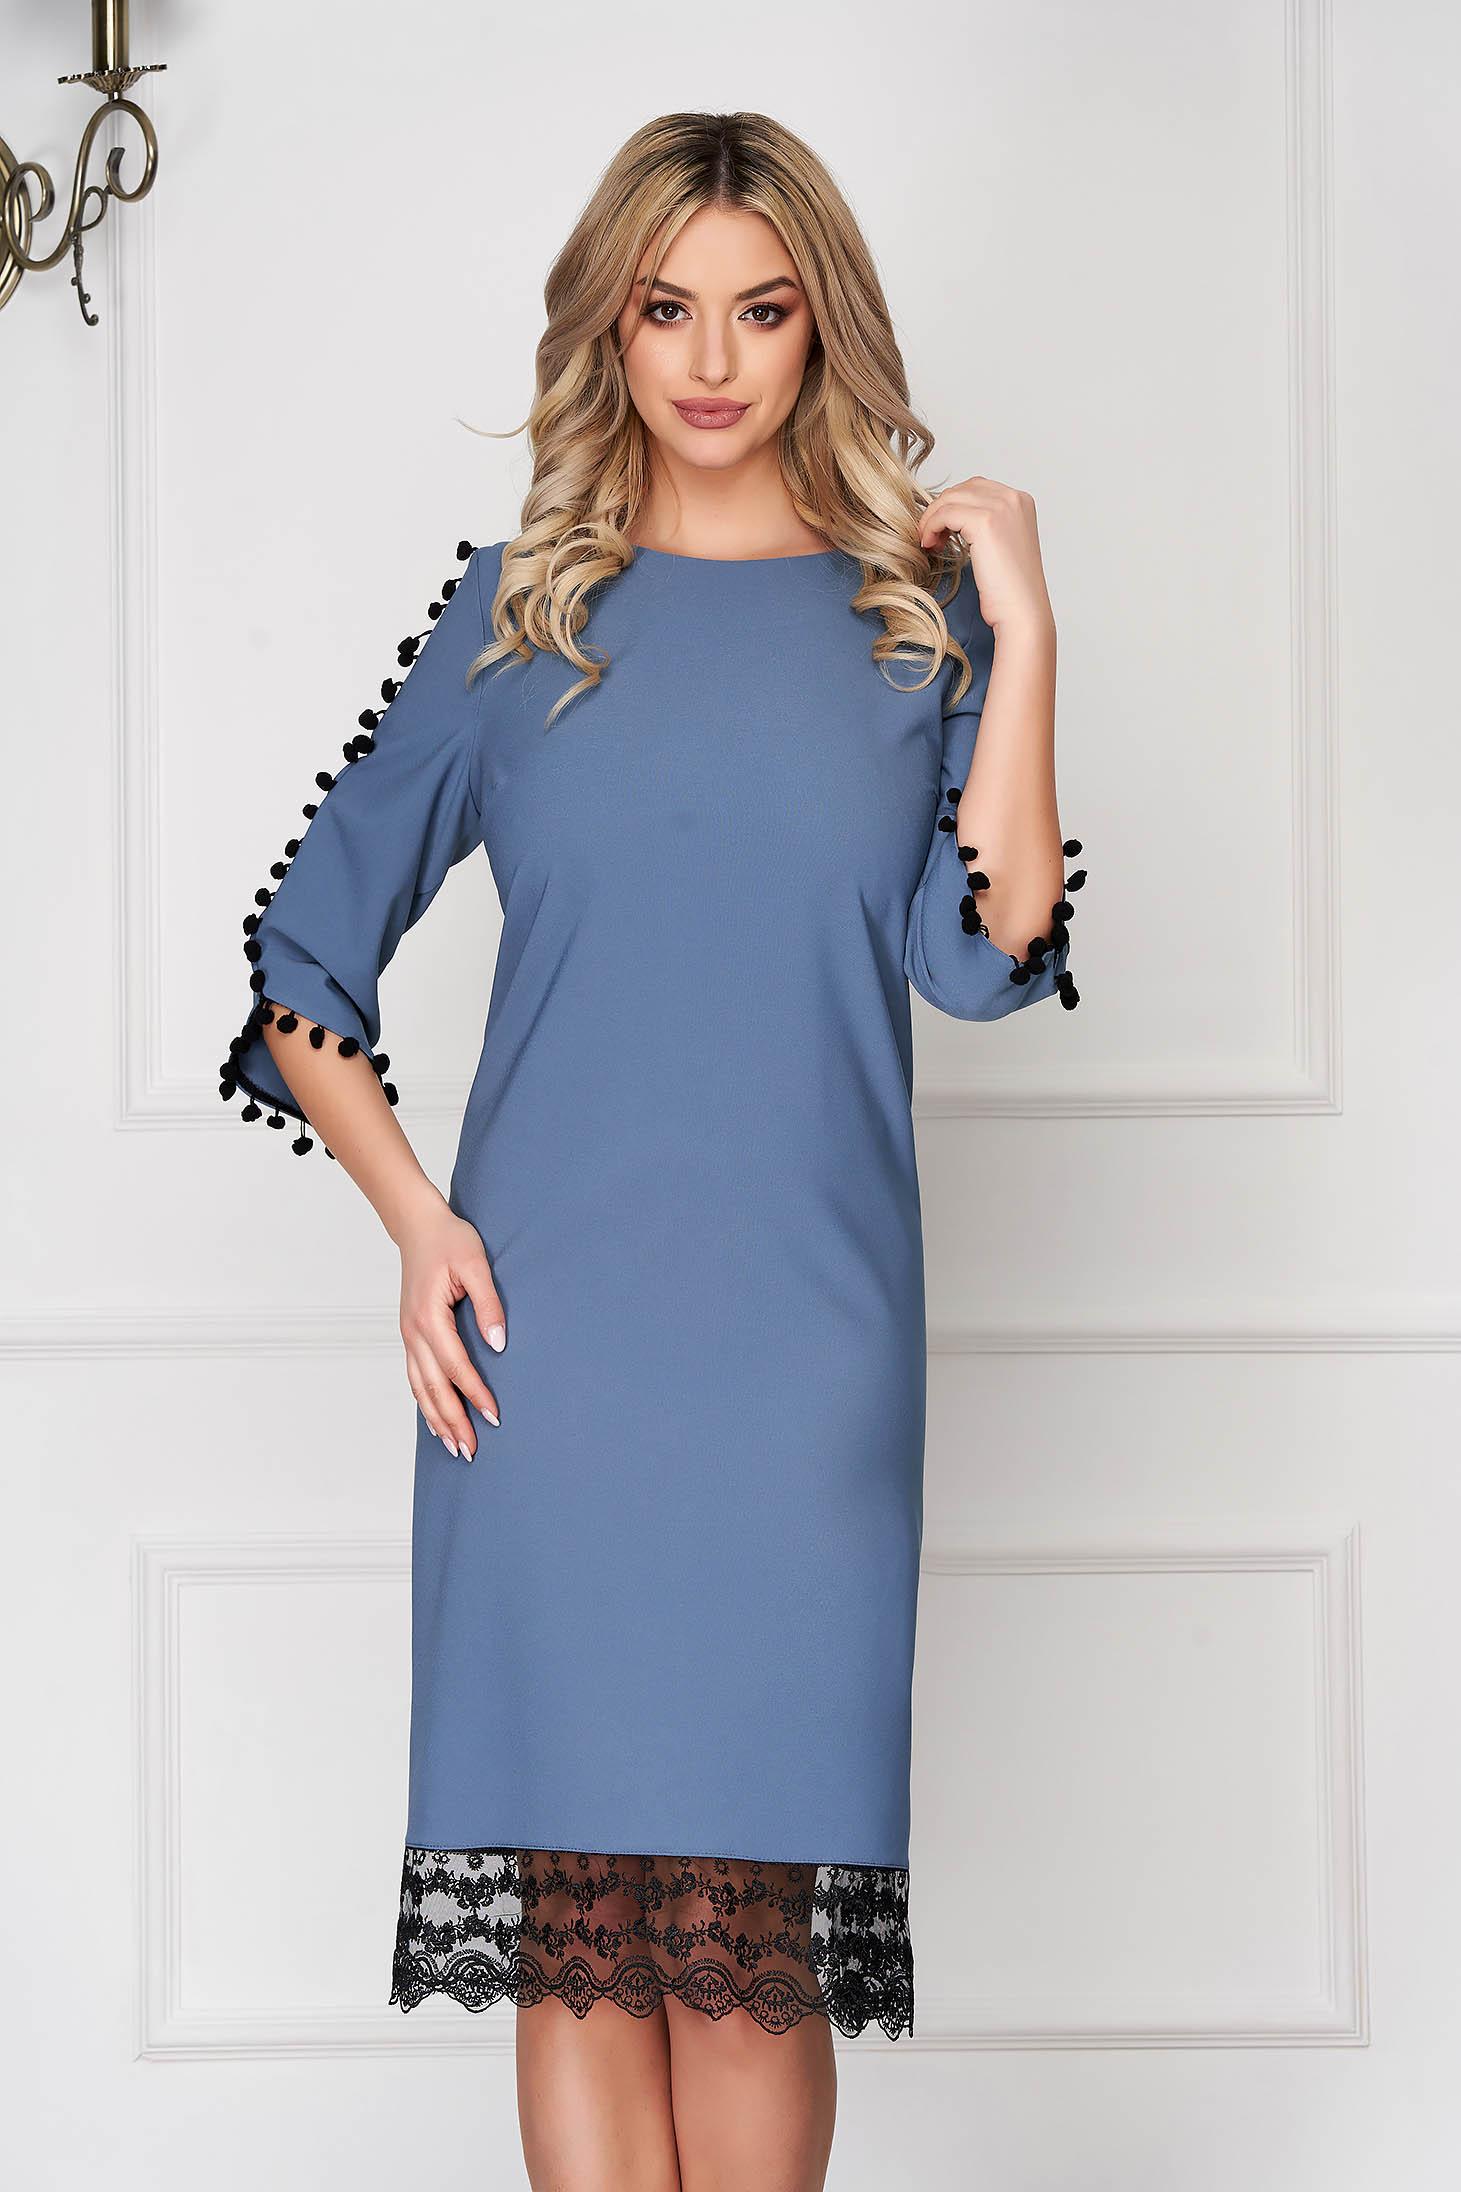 Lightblue dress elegant midi straight cloth with tassels with lace details